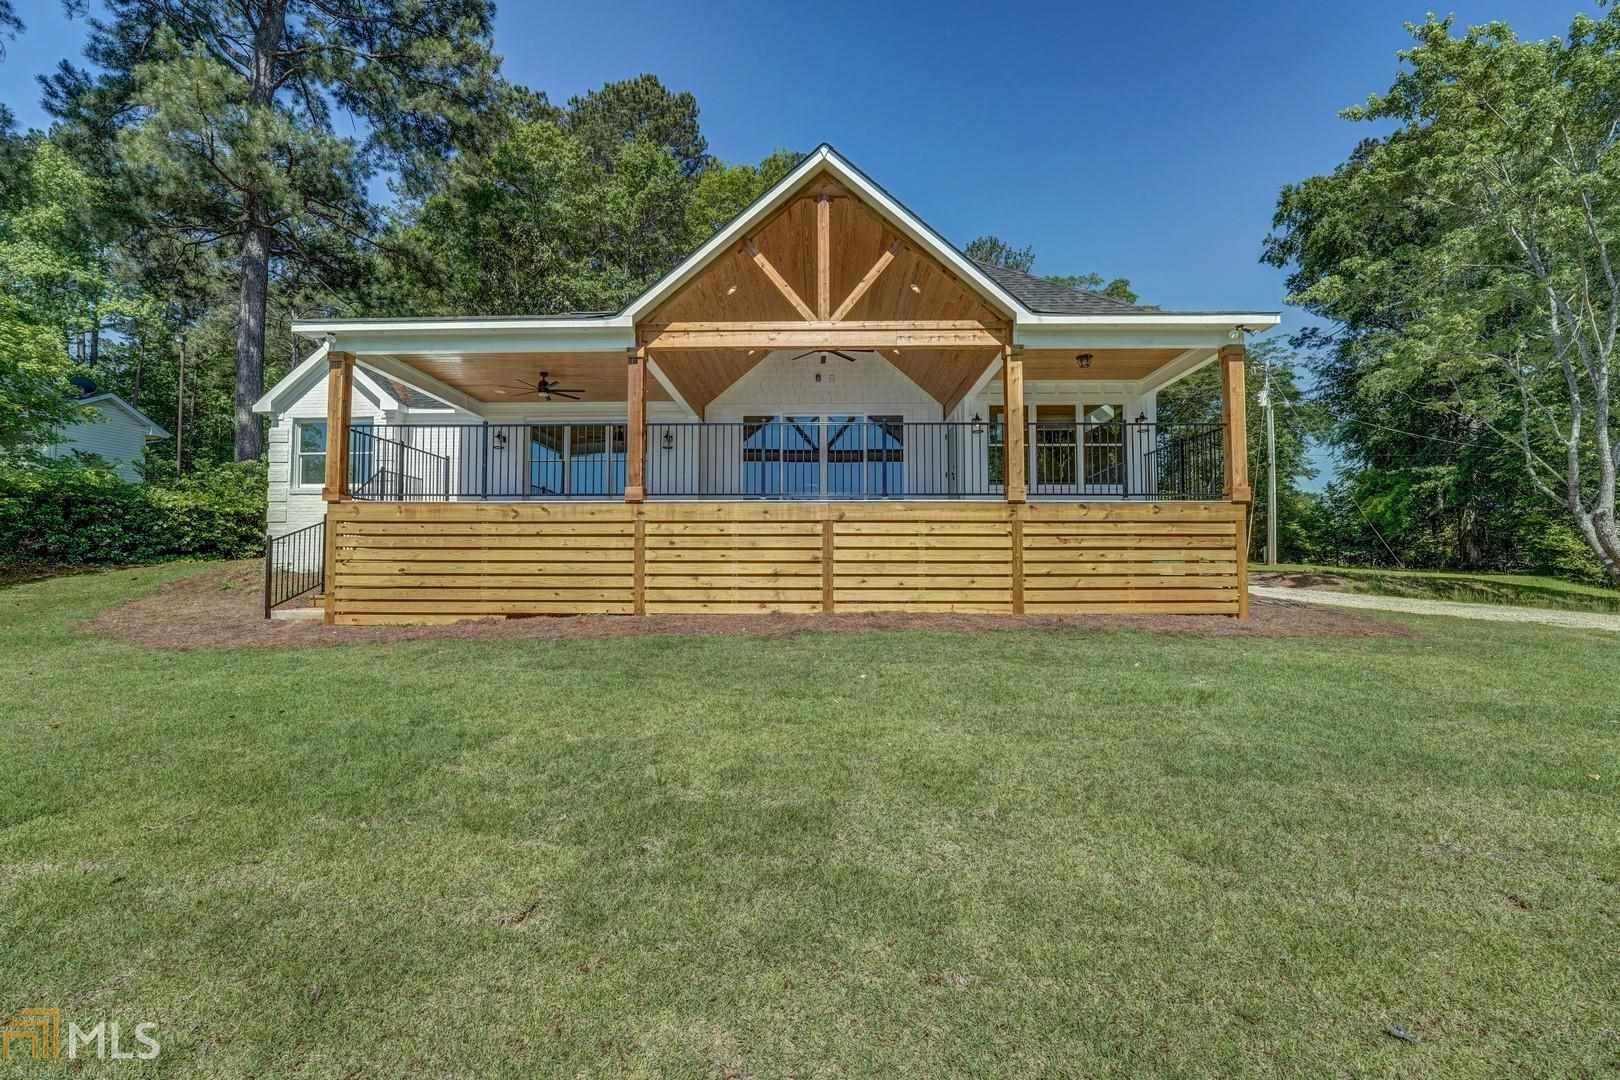 256 Strickland Pasture Rd, Jackson, GA 30233 - #: 8909711